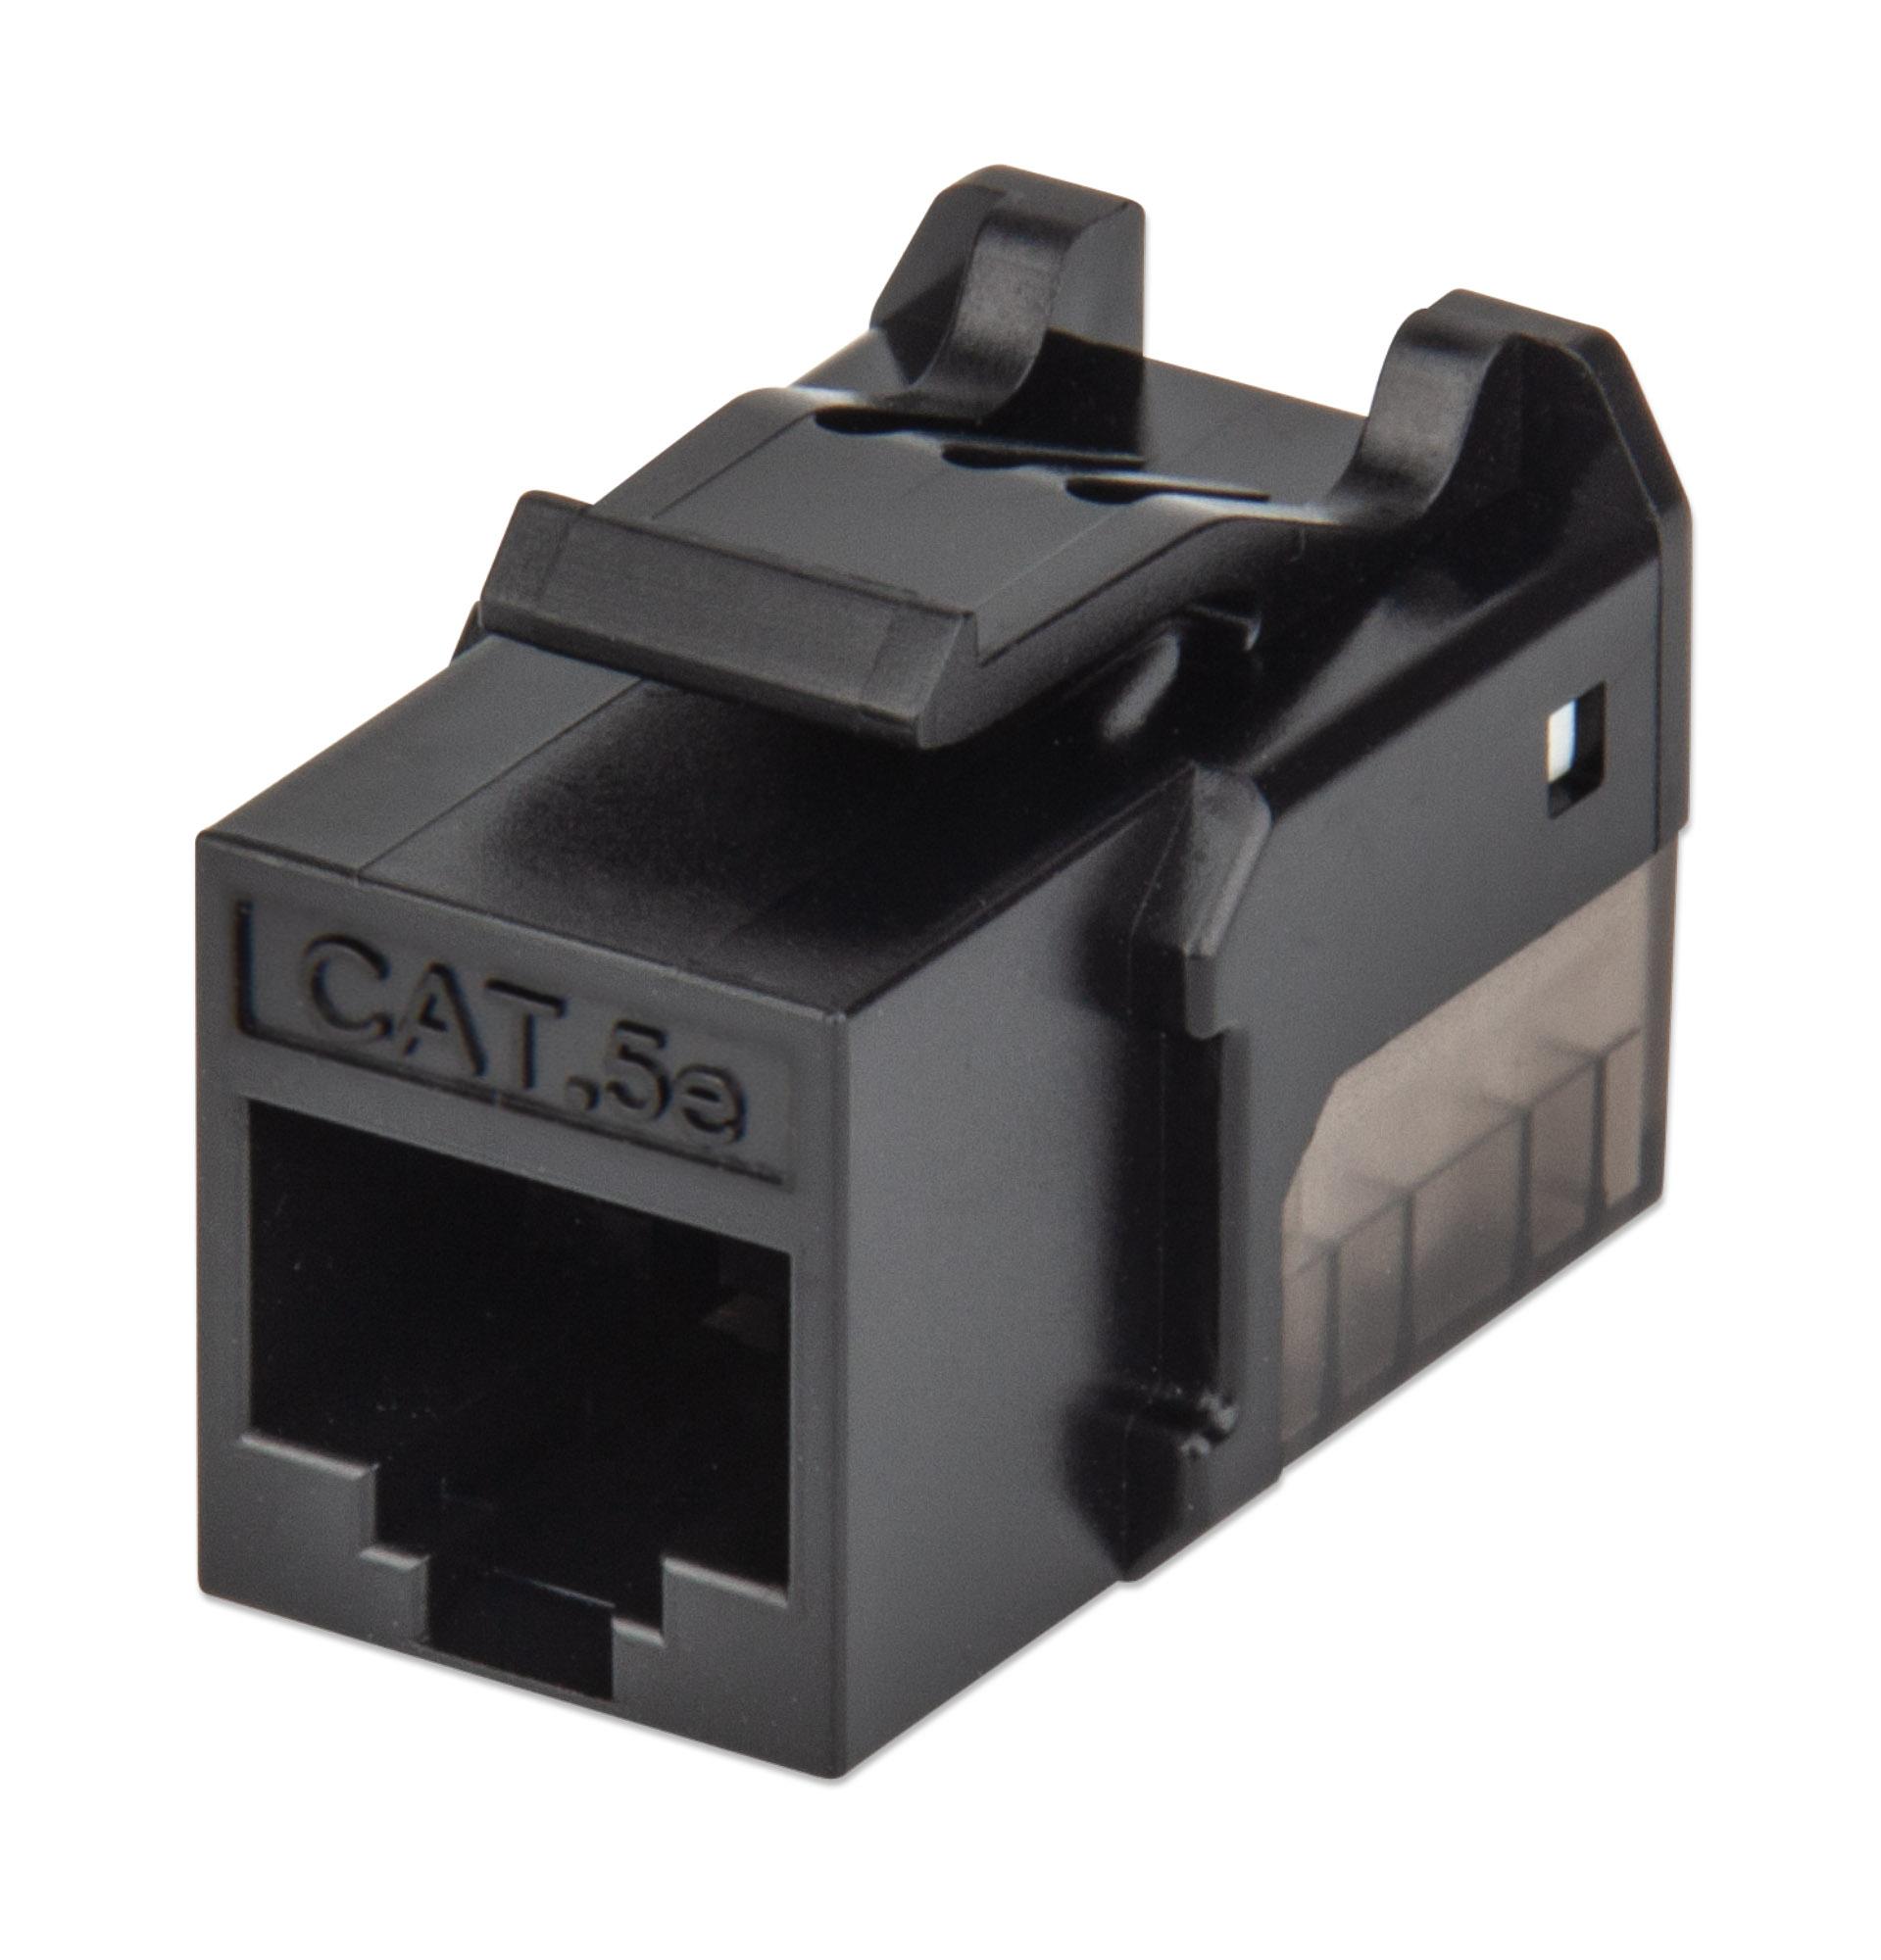 FastPunch Cat5e Keystone Jack